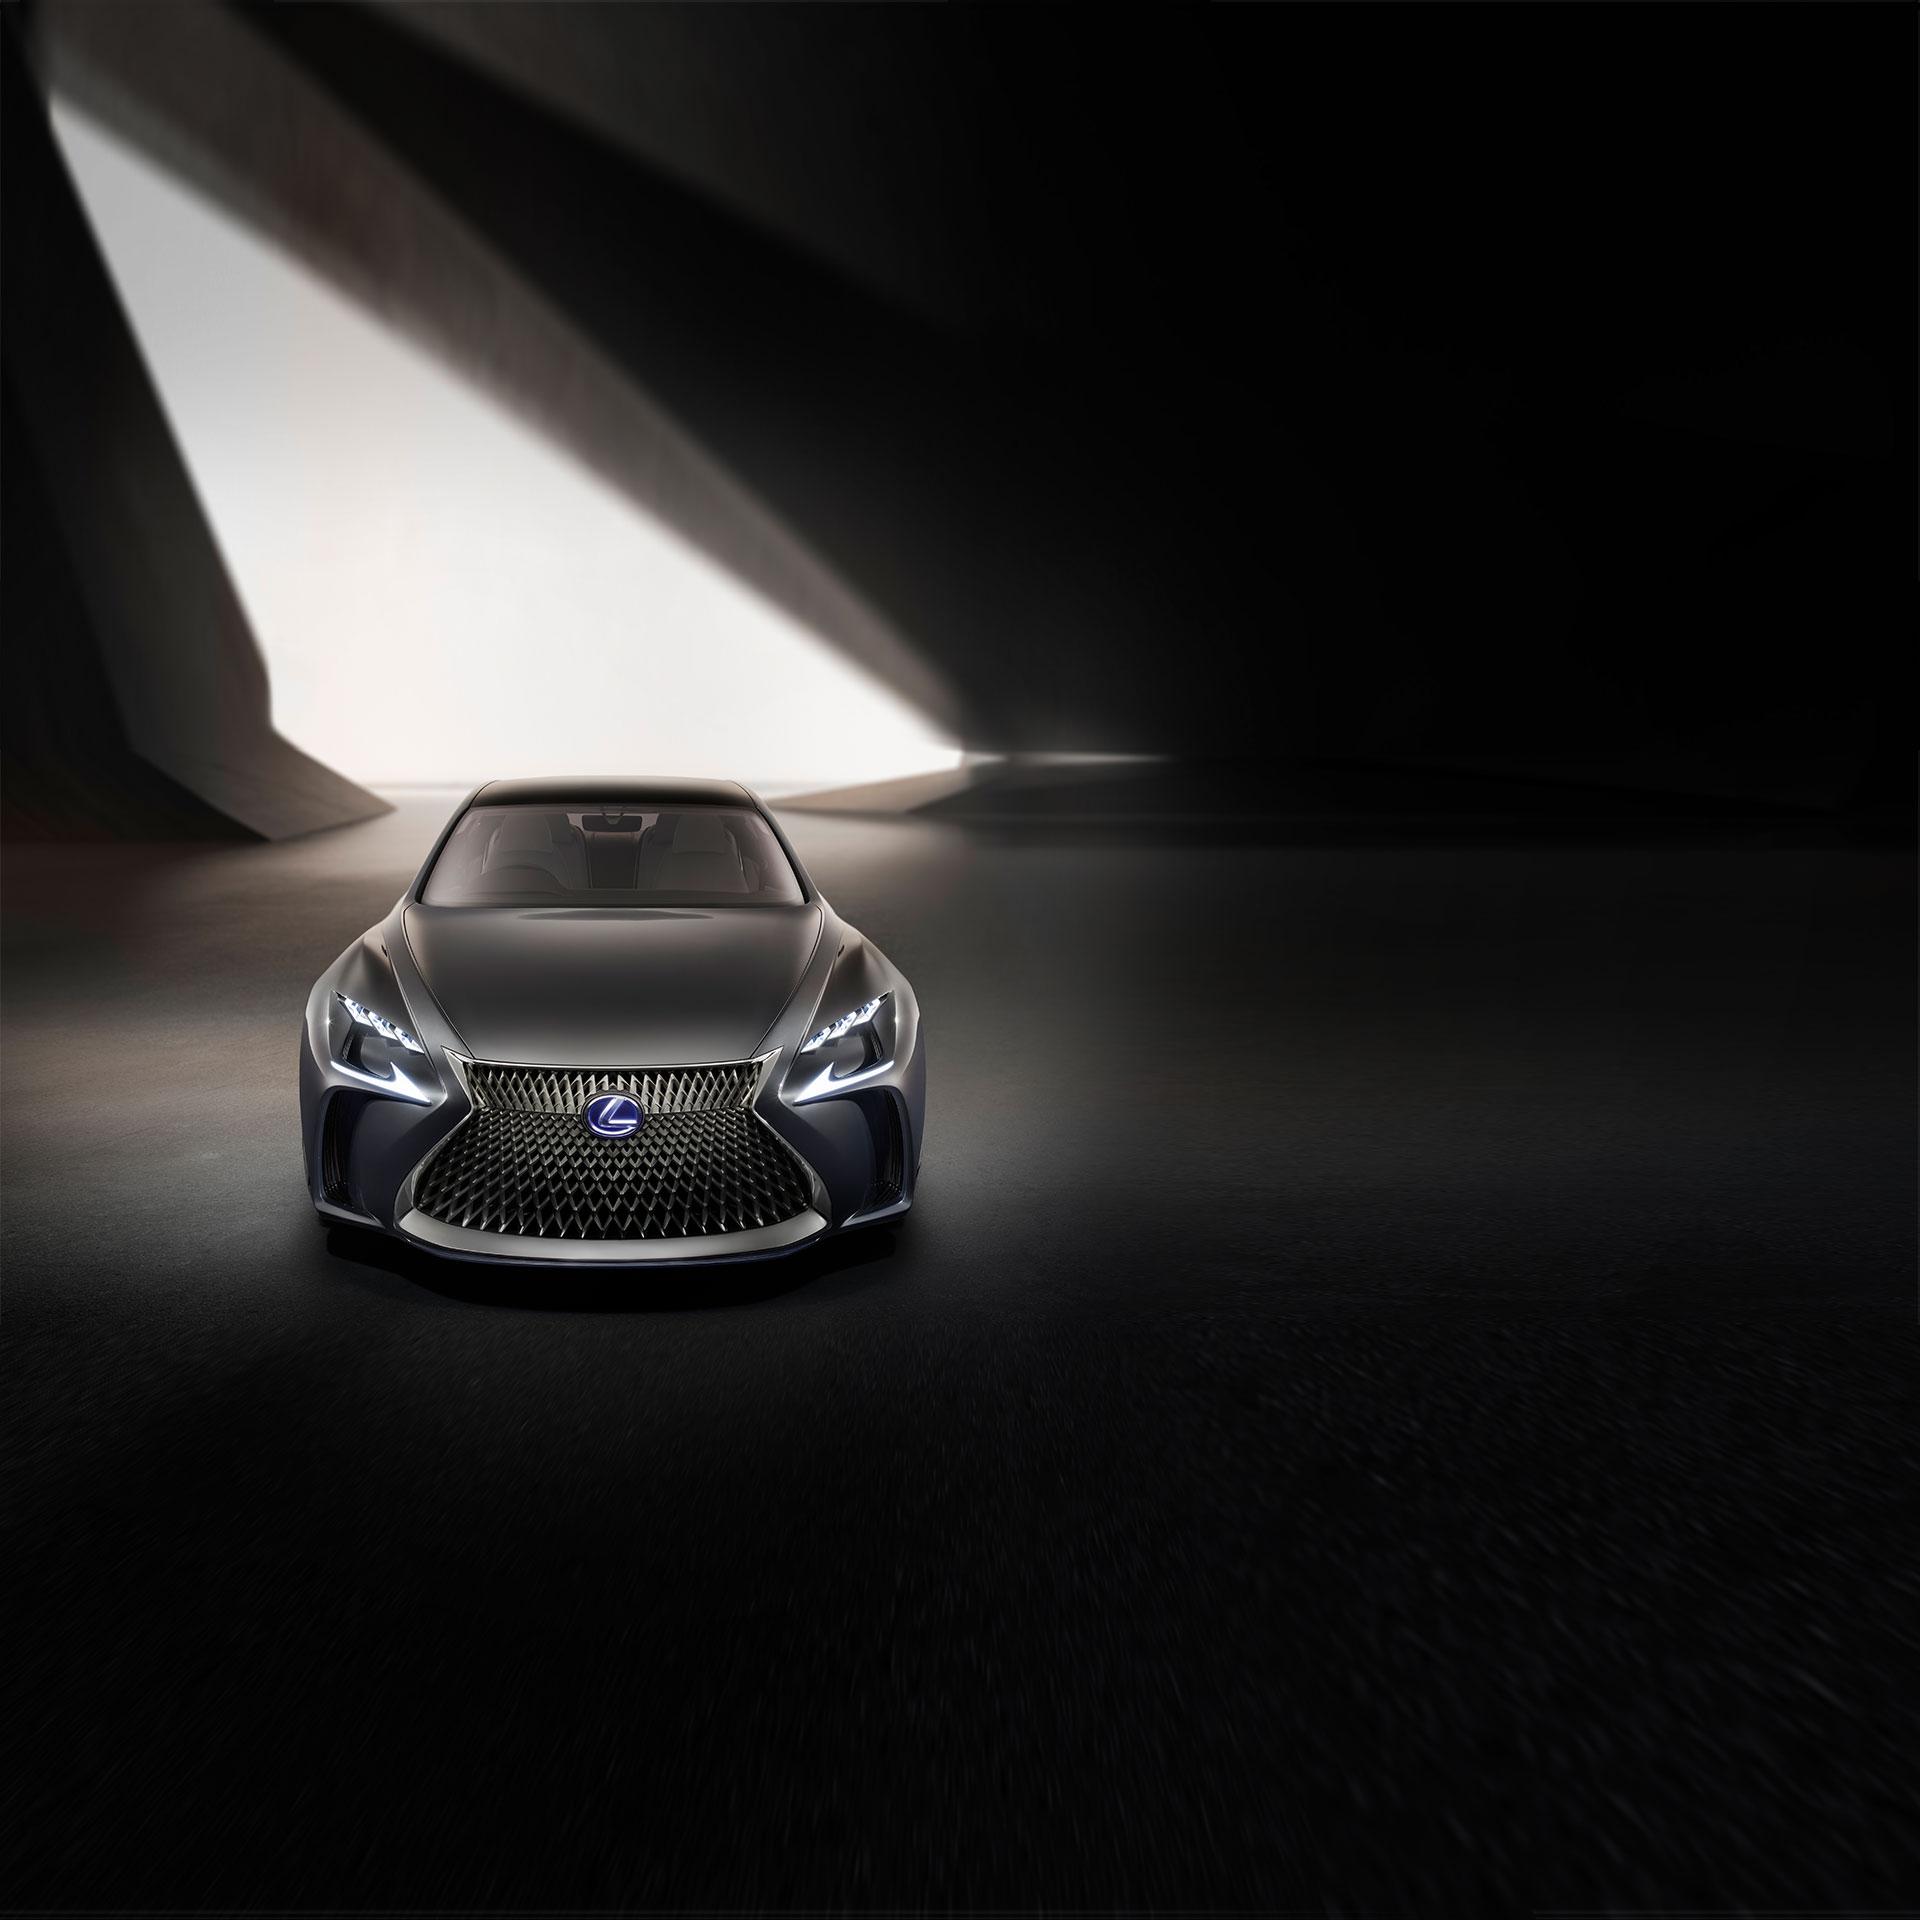 2017 lexus concept cars lf fc